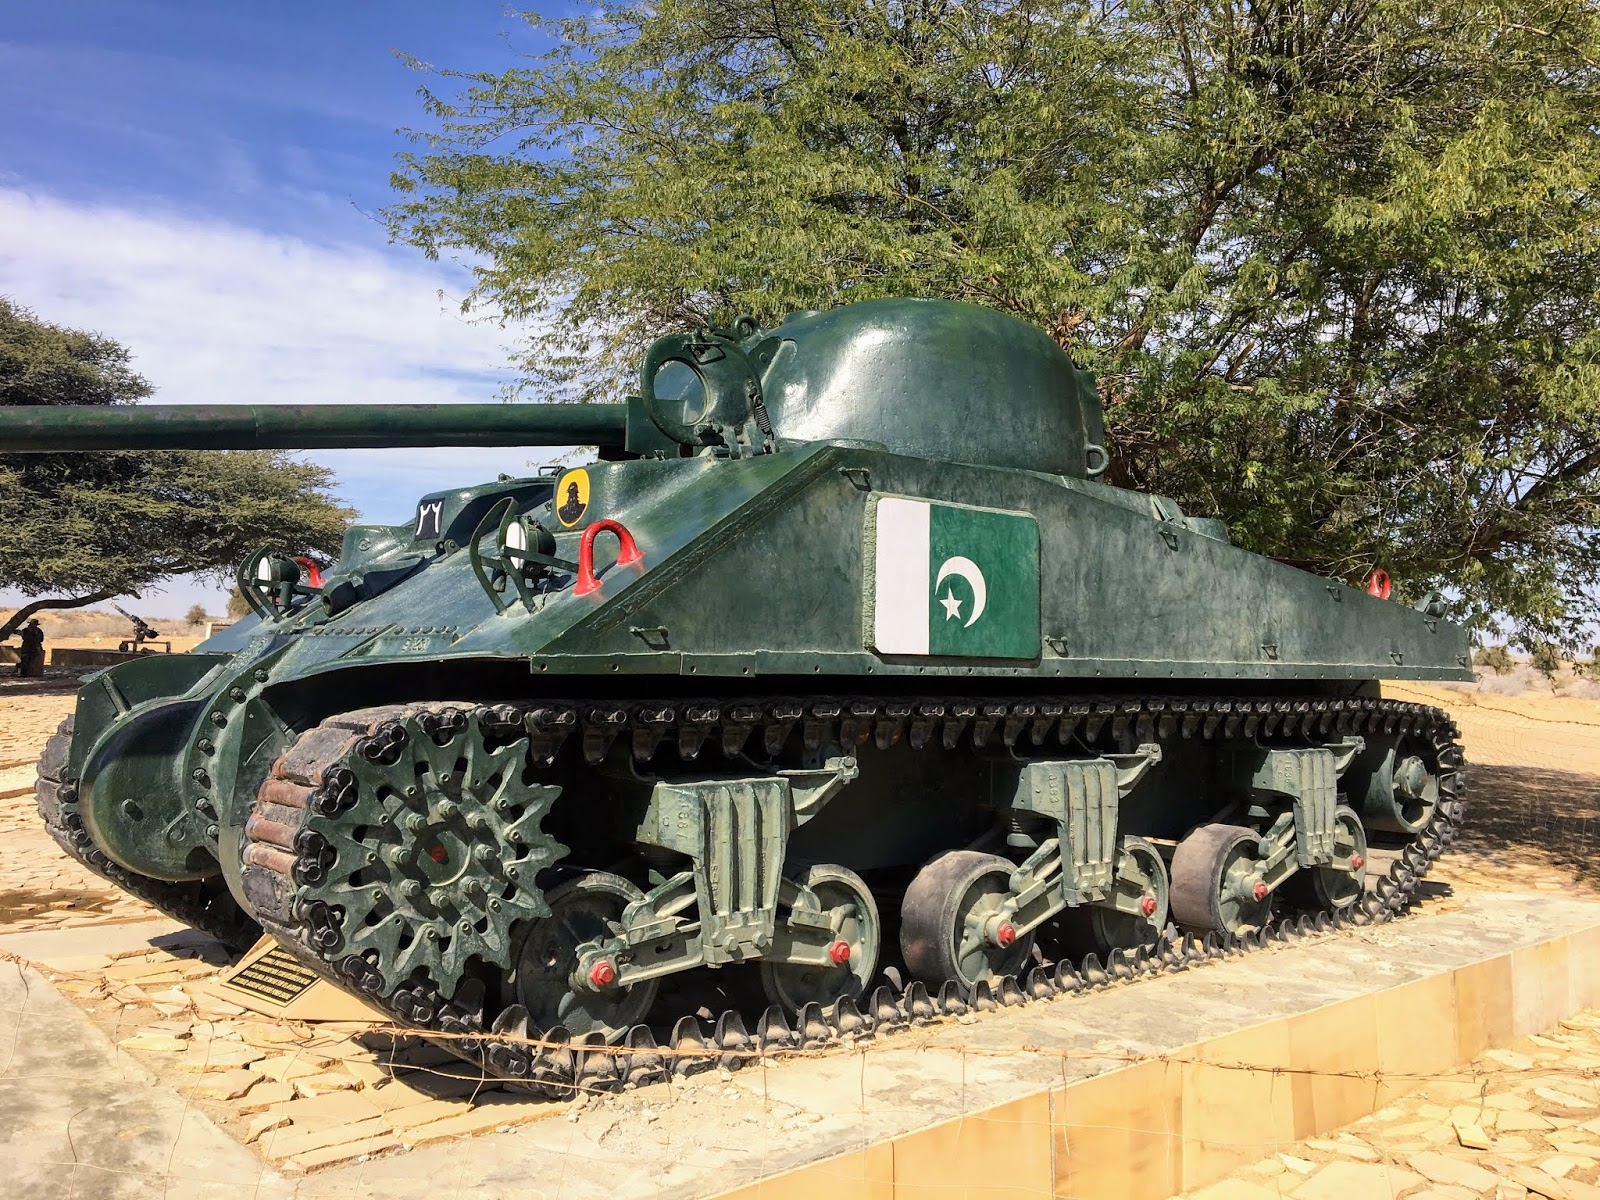 Pakistani tank captured during the Battle of Longewala in 1971, Rajasthan